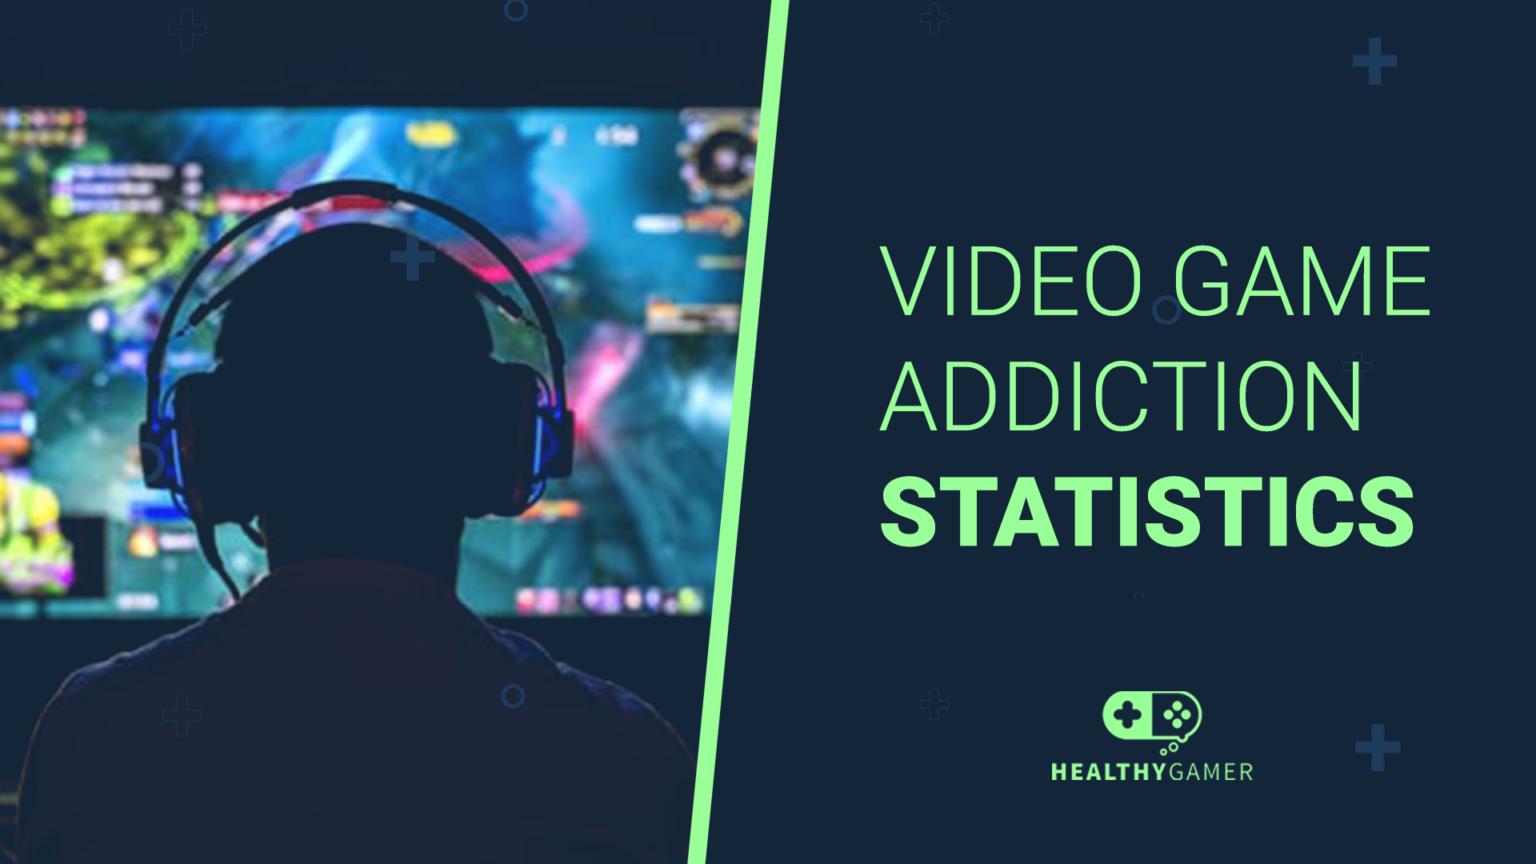 Video Game Addiction Statistics